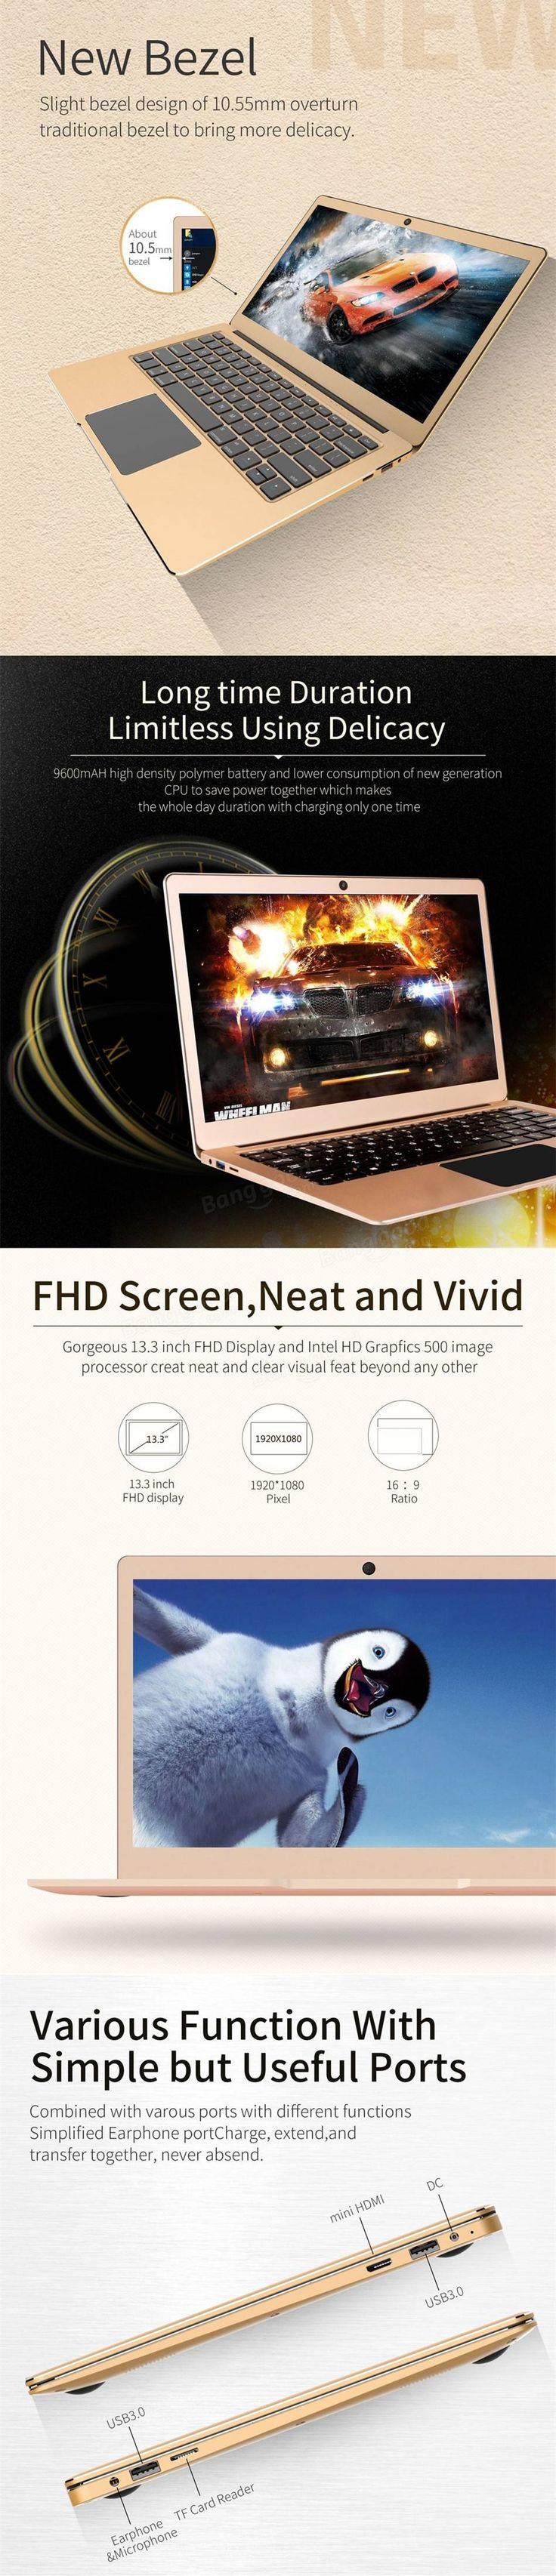 JumperEZBOOK3PRONotebook13,3 polegadas 6G / 64G Windows10 Intel Apollo Lake N3450 Laptop